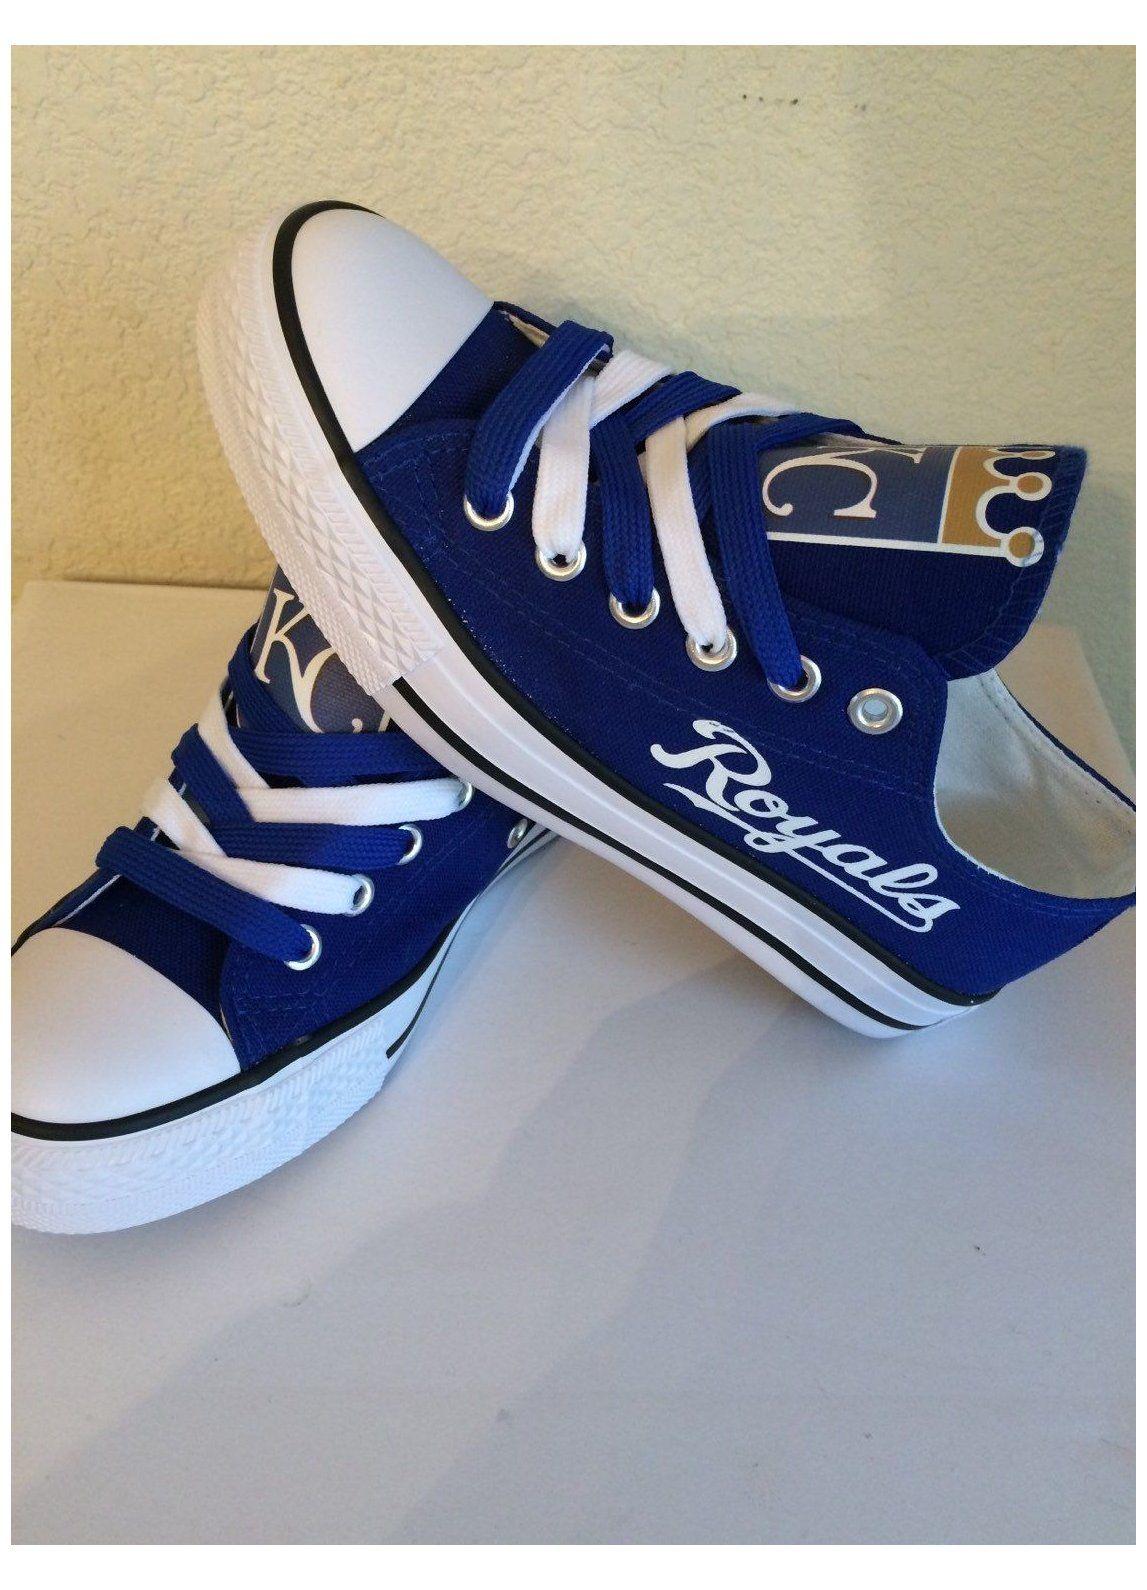 Blue Tennis Shoes Outfit Royal Bluetennisshoesoutfitroyal In 2021 Kansas City Royals Kc Royals Kansas City Royals Baseball